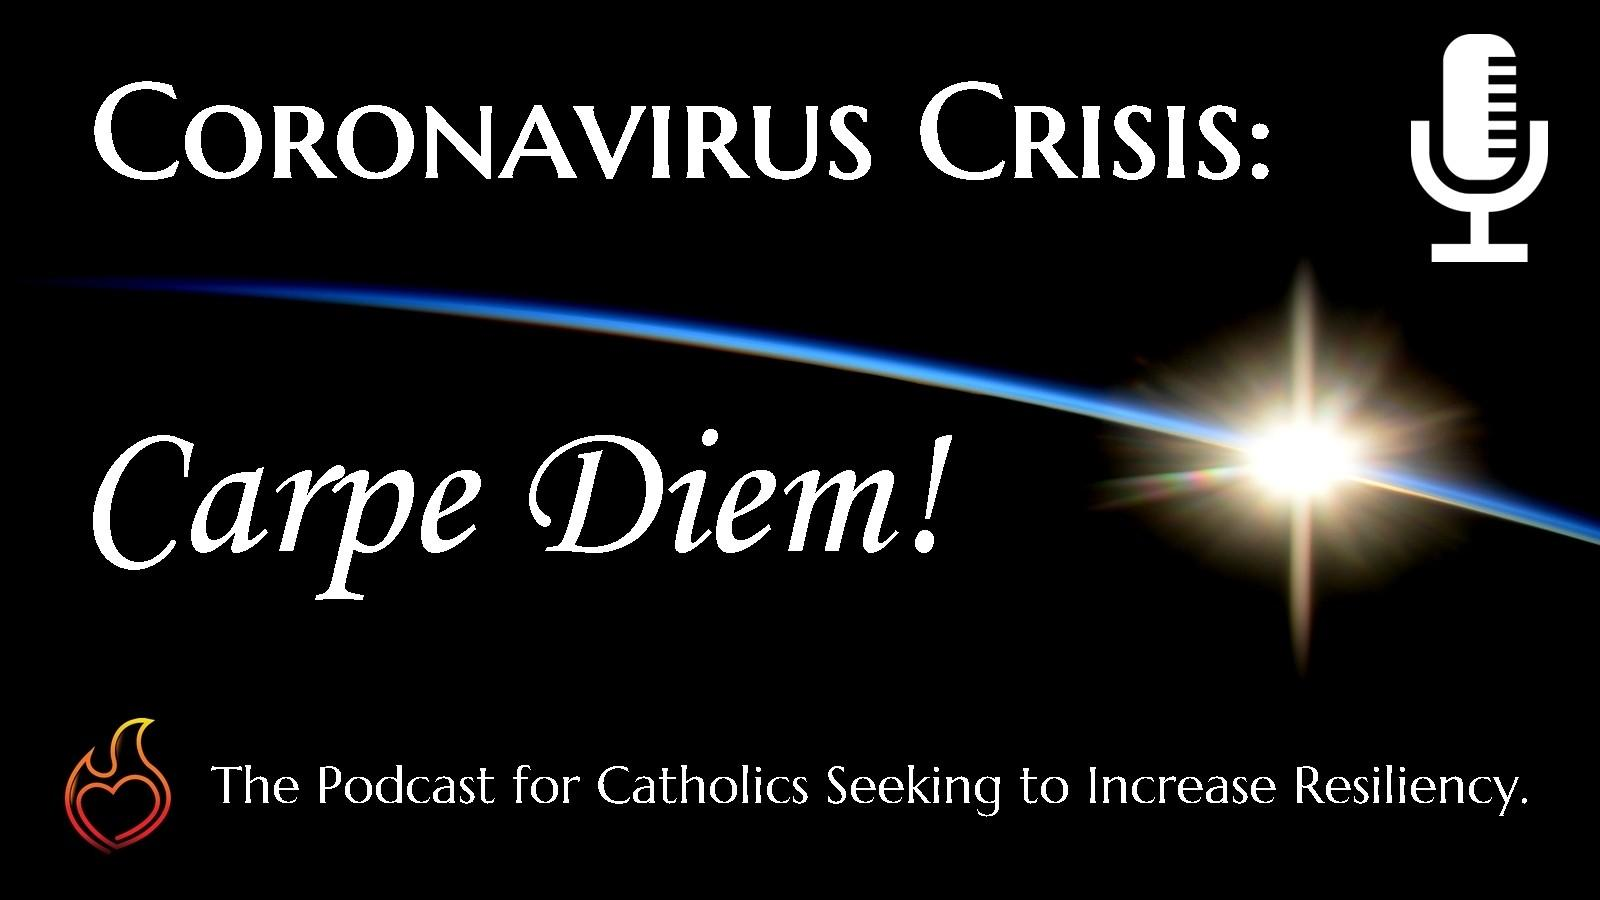 Coronavirus Crisis Podcast, resilience and spiritual growth during COVID-19